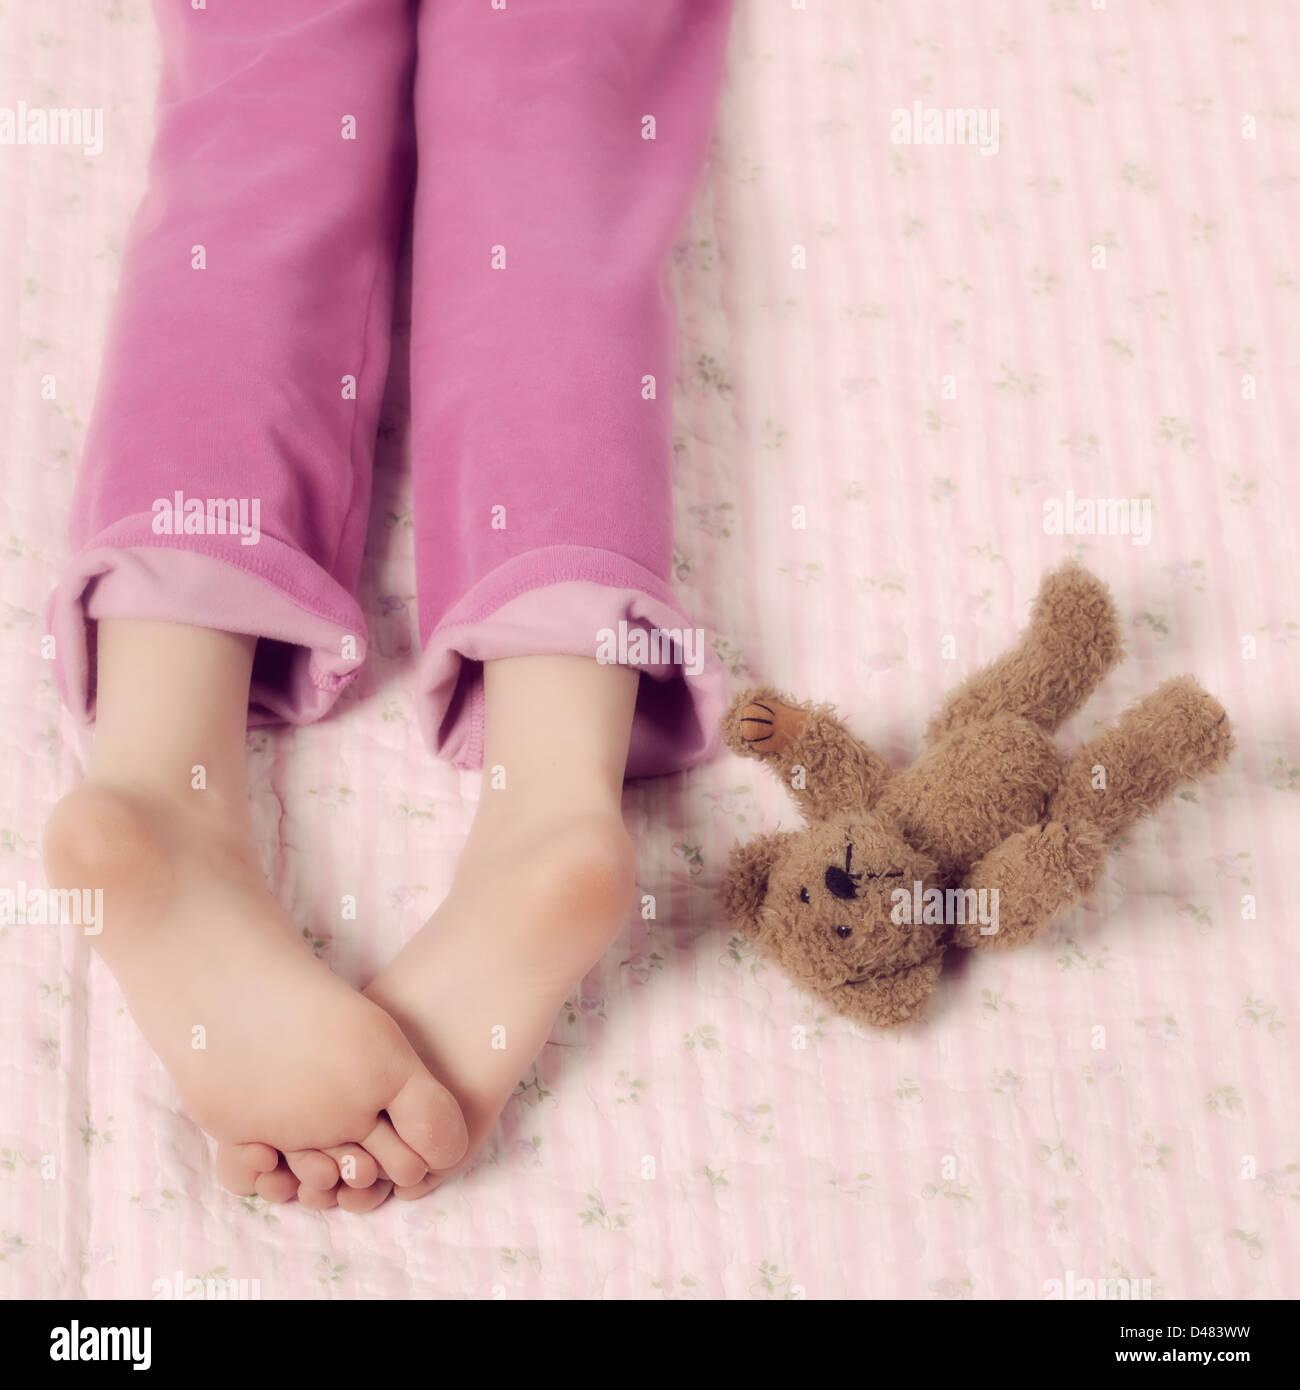 female feet in pink pyjamas with a teddy bear Stock Photo